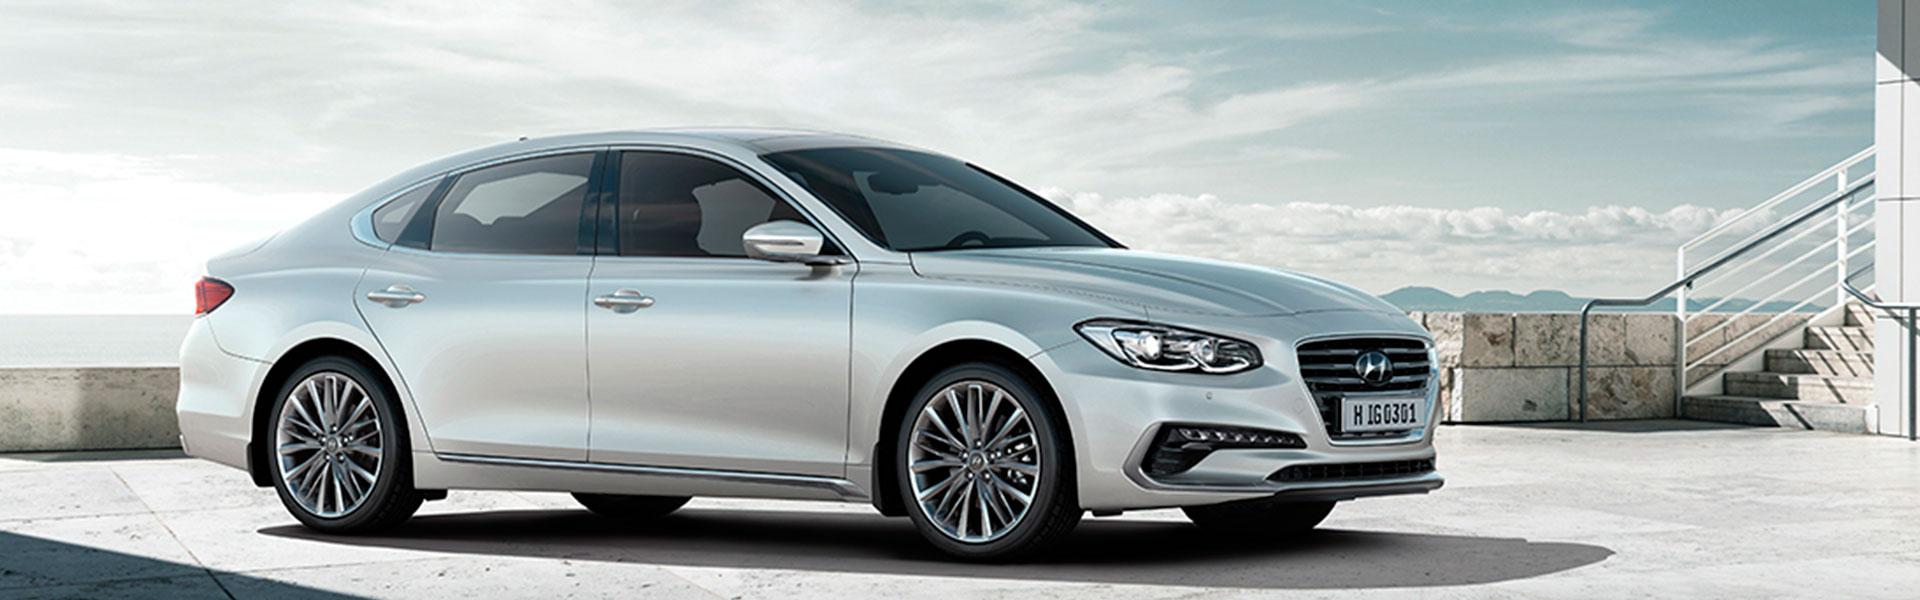 Hyundai Grandeur - обзор